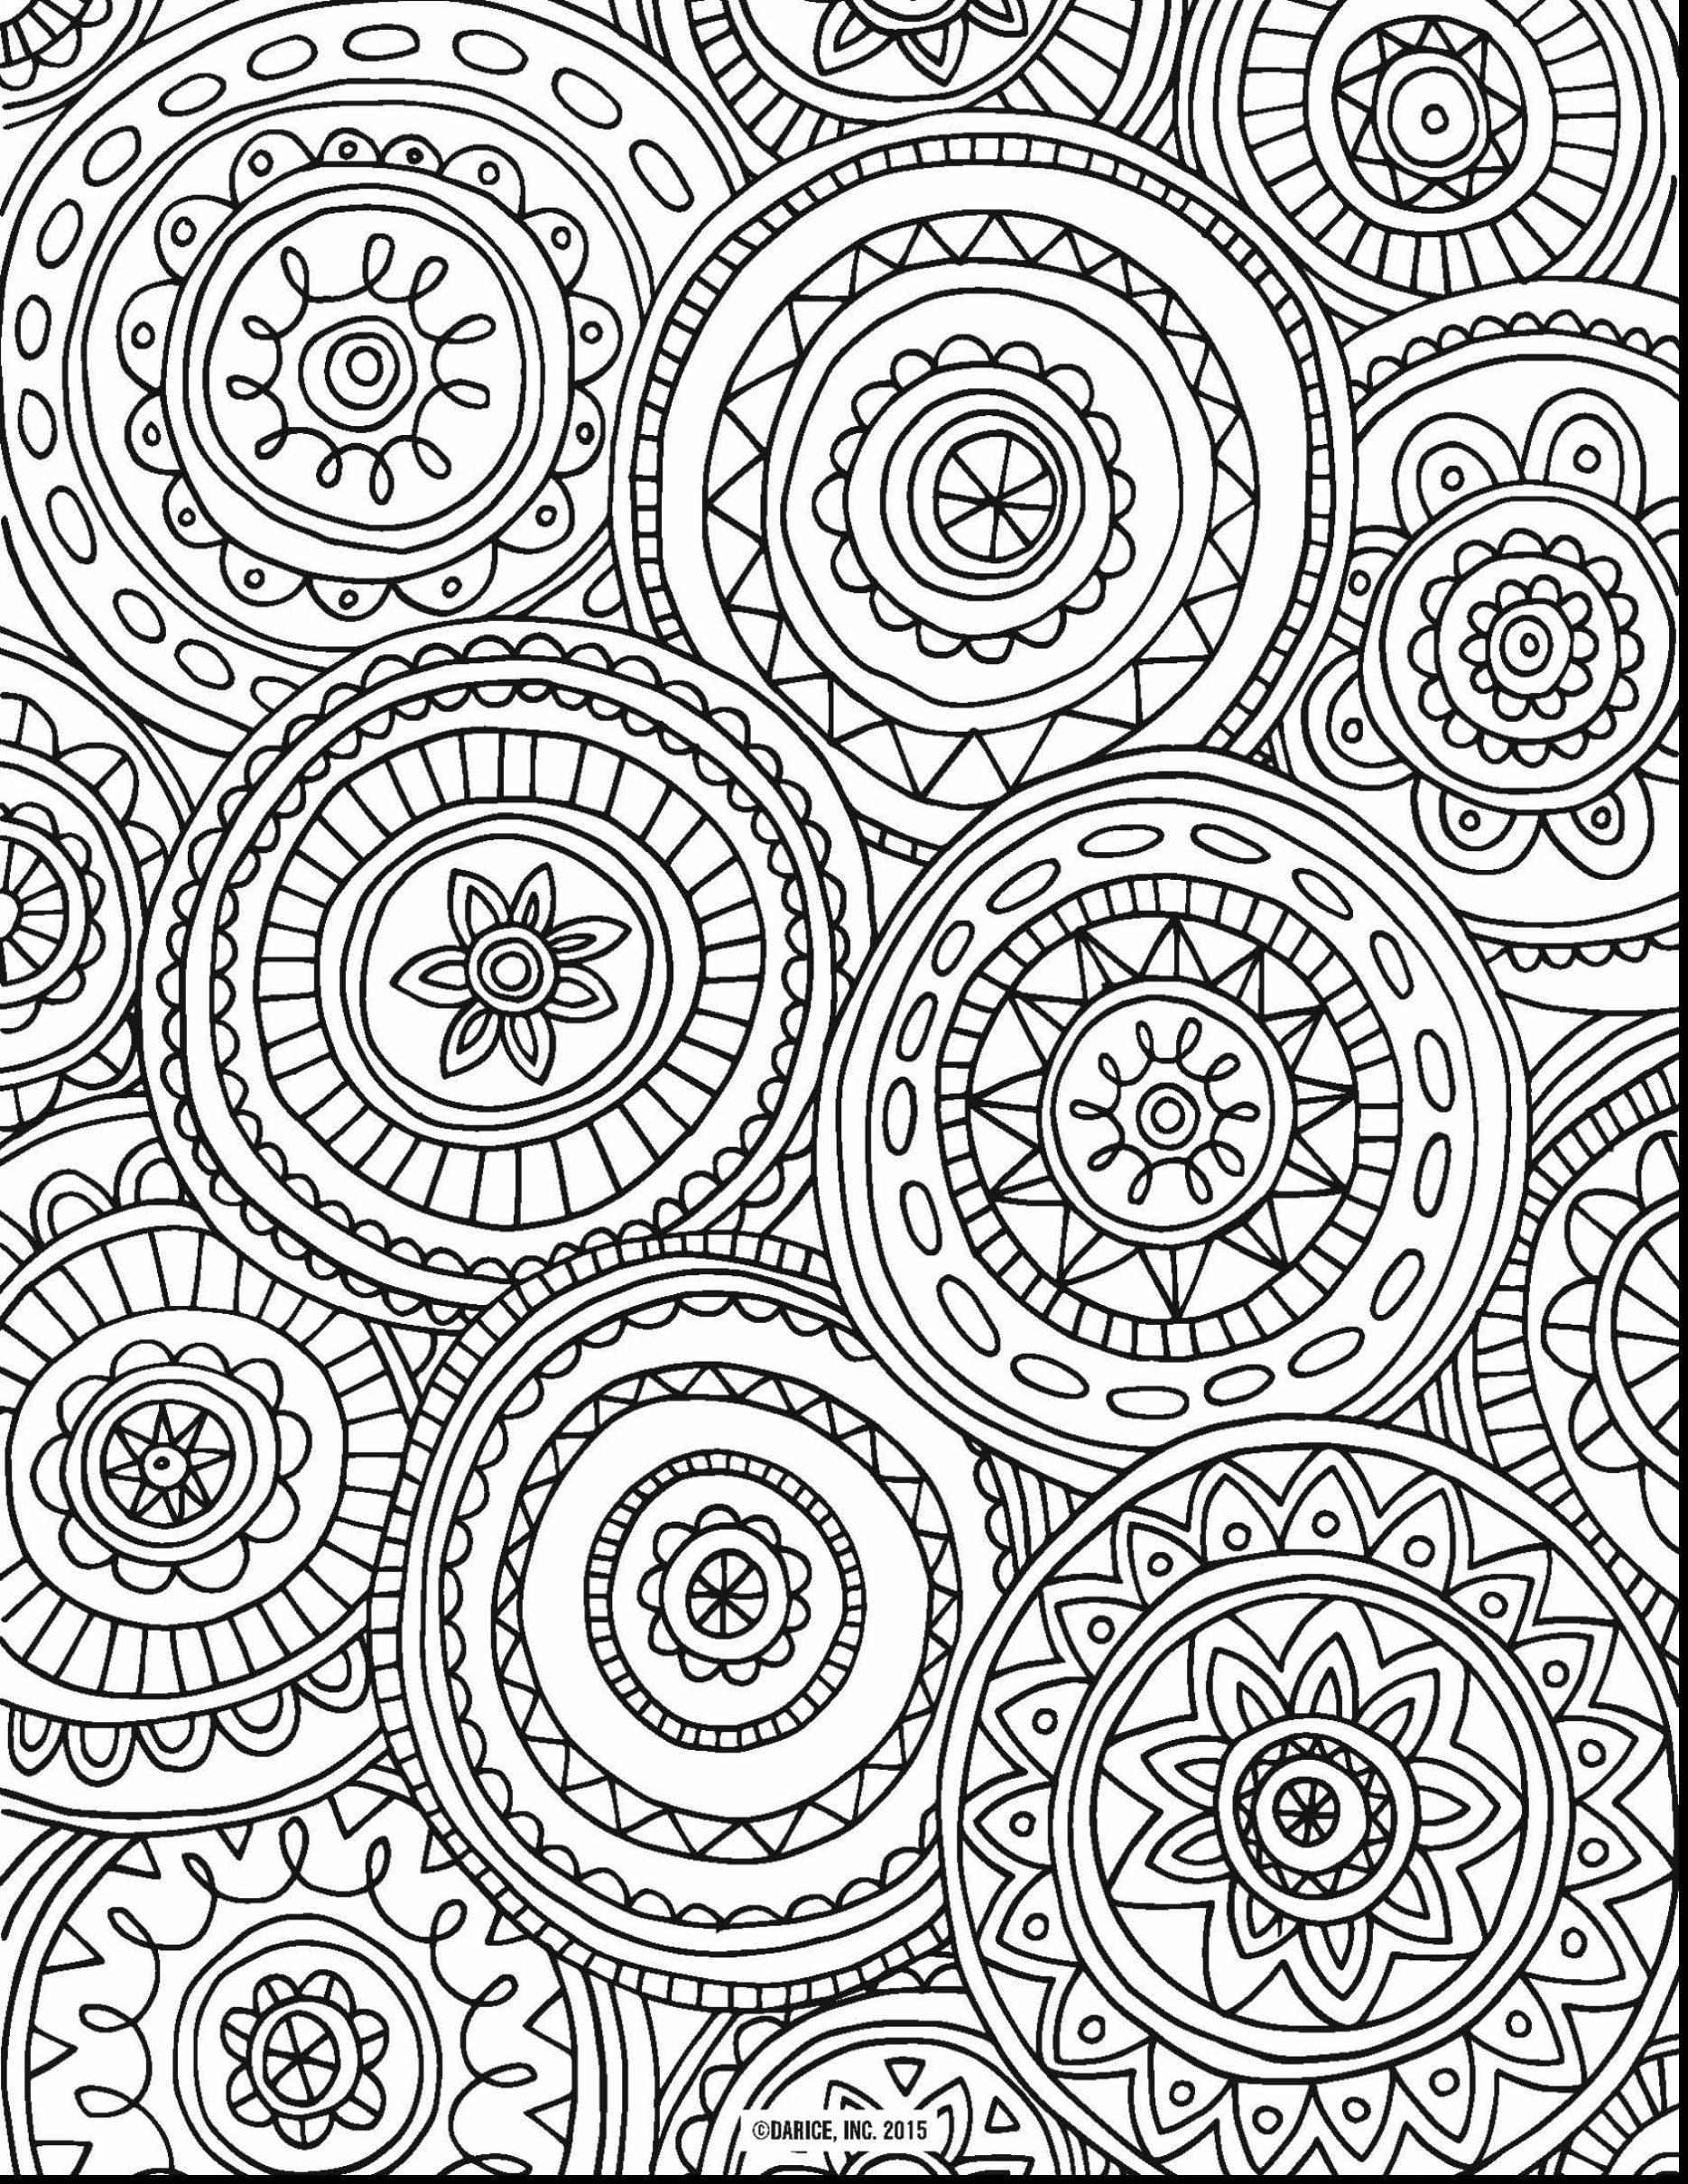 Best Of Free Printable Mandala Coloring Pages For Adults Pdf - Free Printable Coloring Pages For Adults Pdf